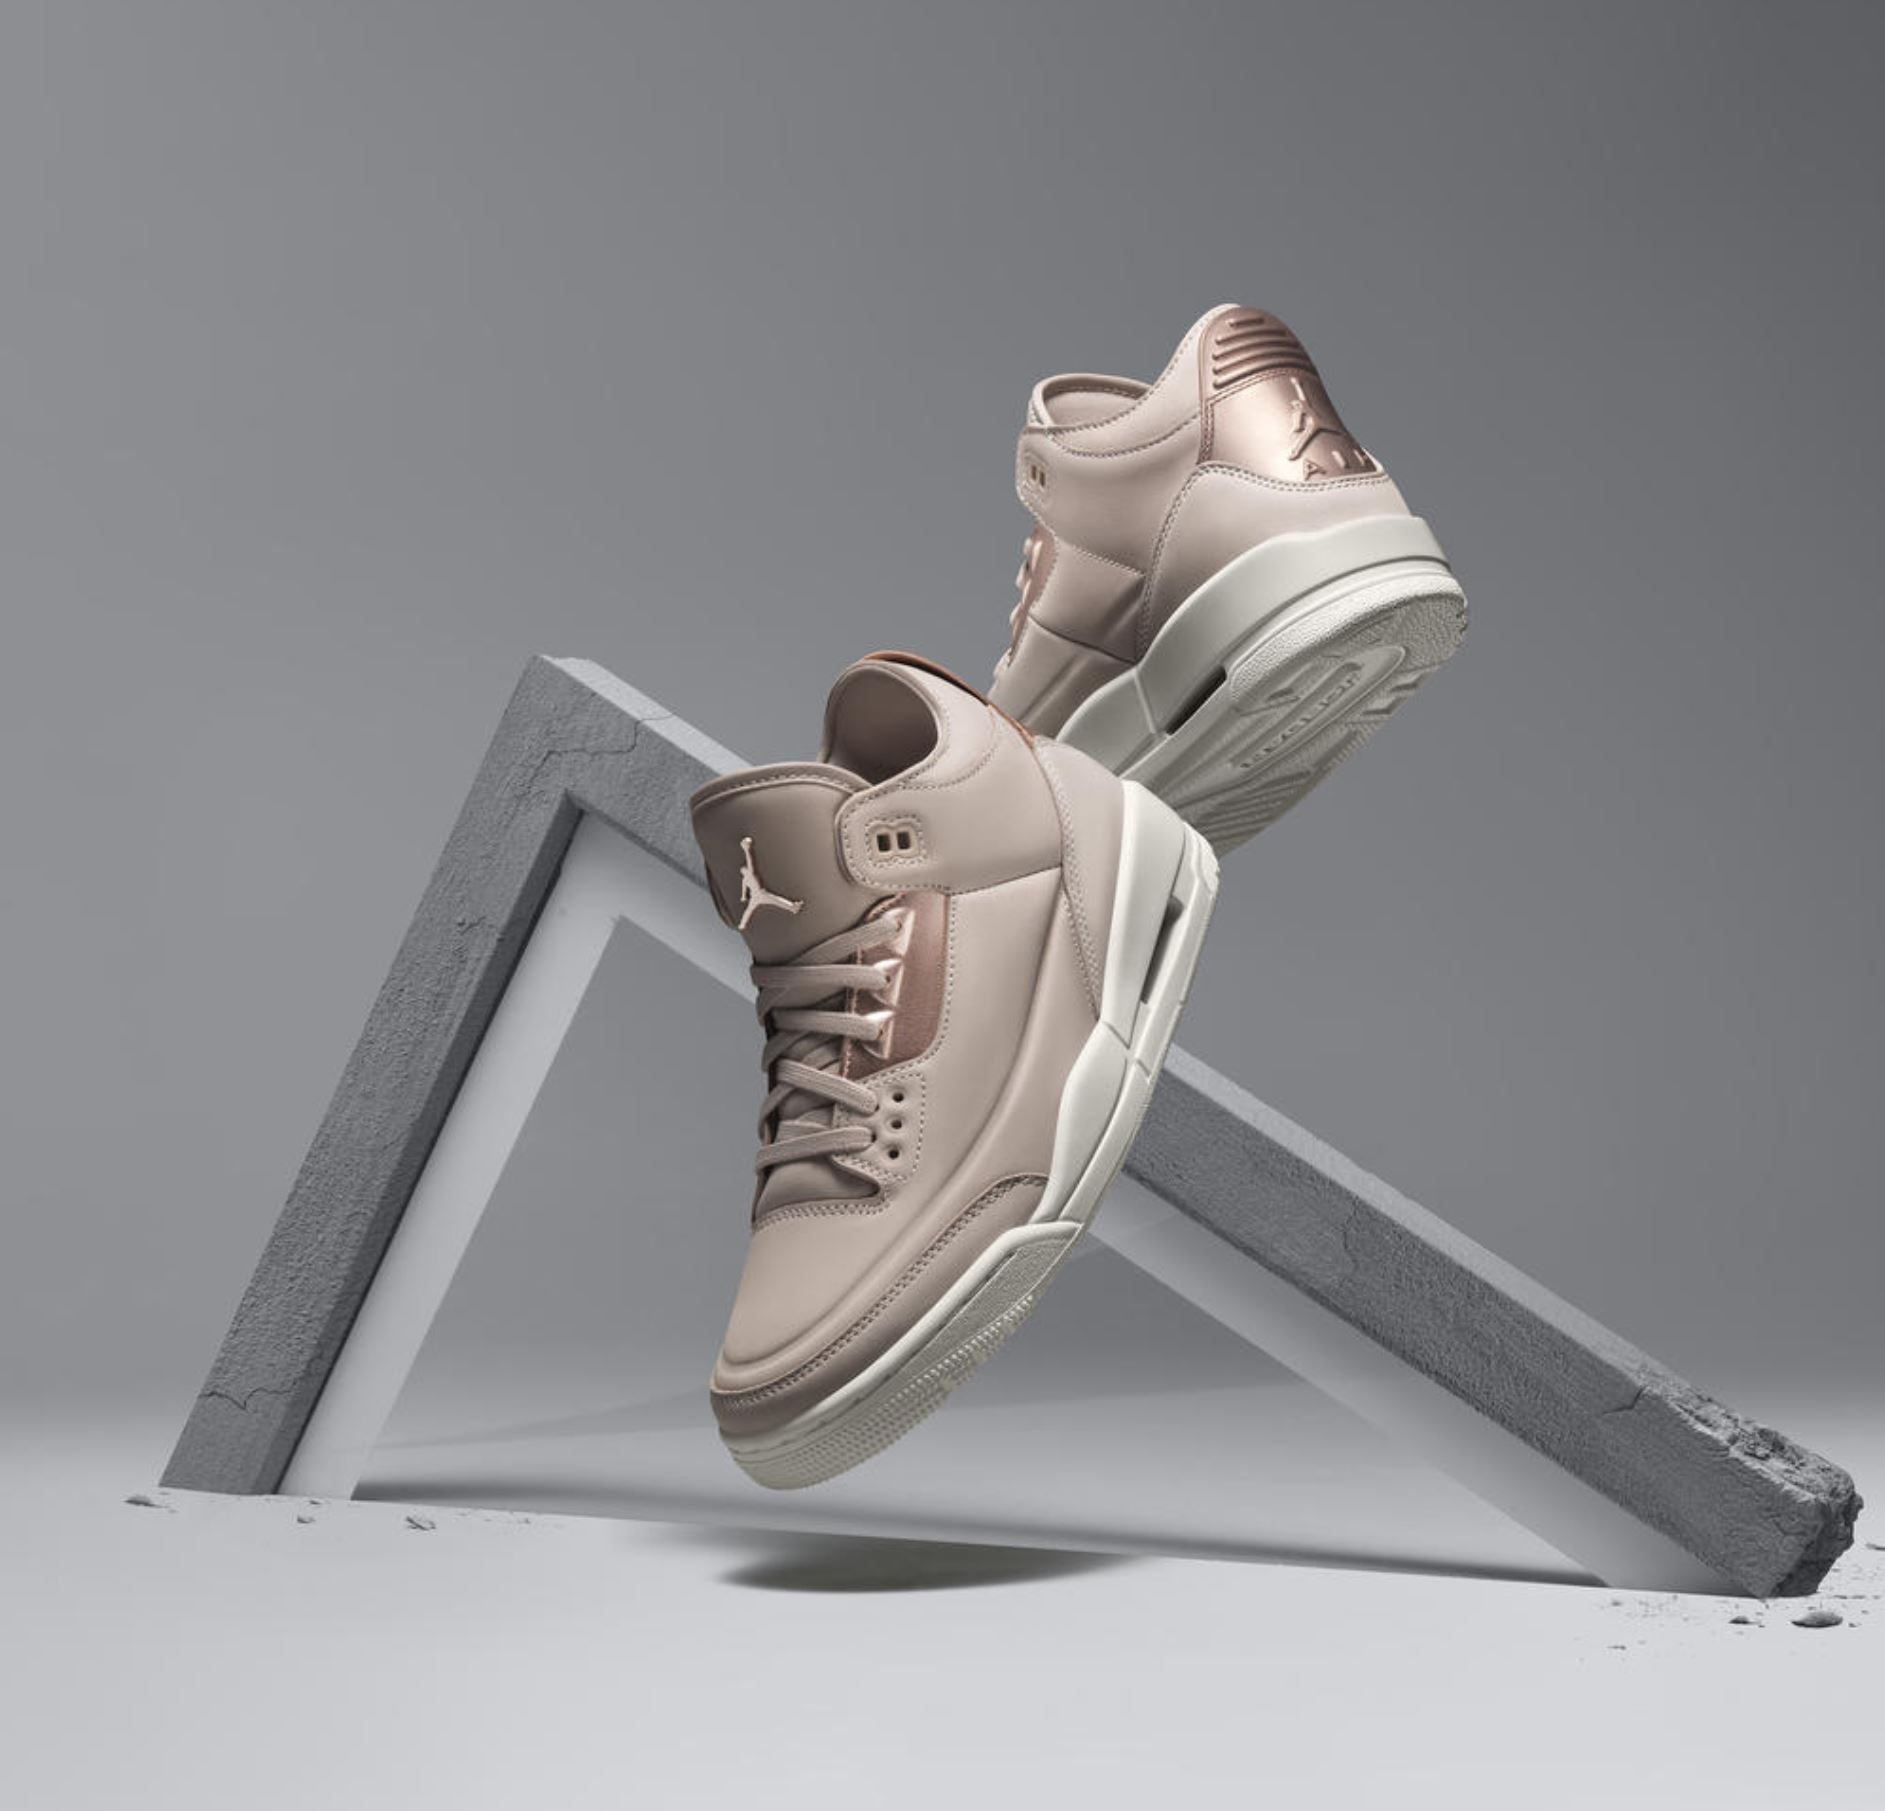 497653ce1 Jordan Brand Unveils Women s Styles for Summer  18 - WearTesters